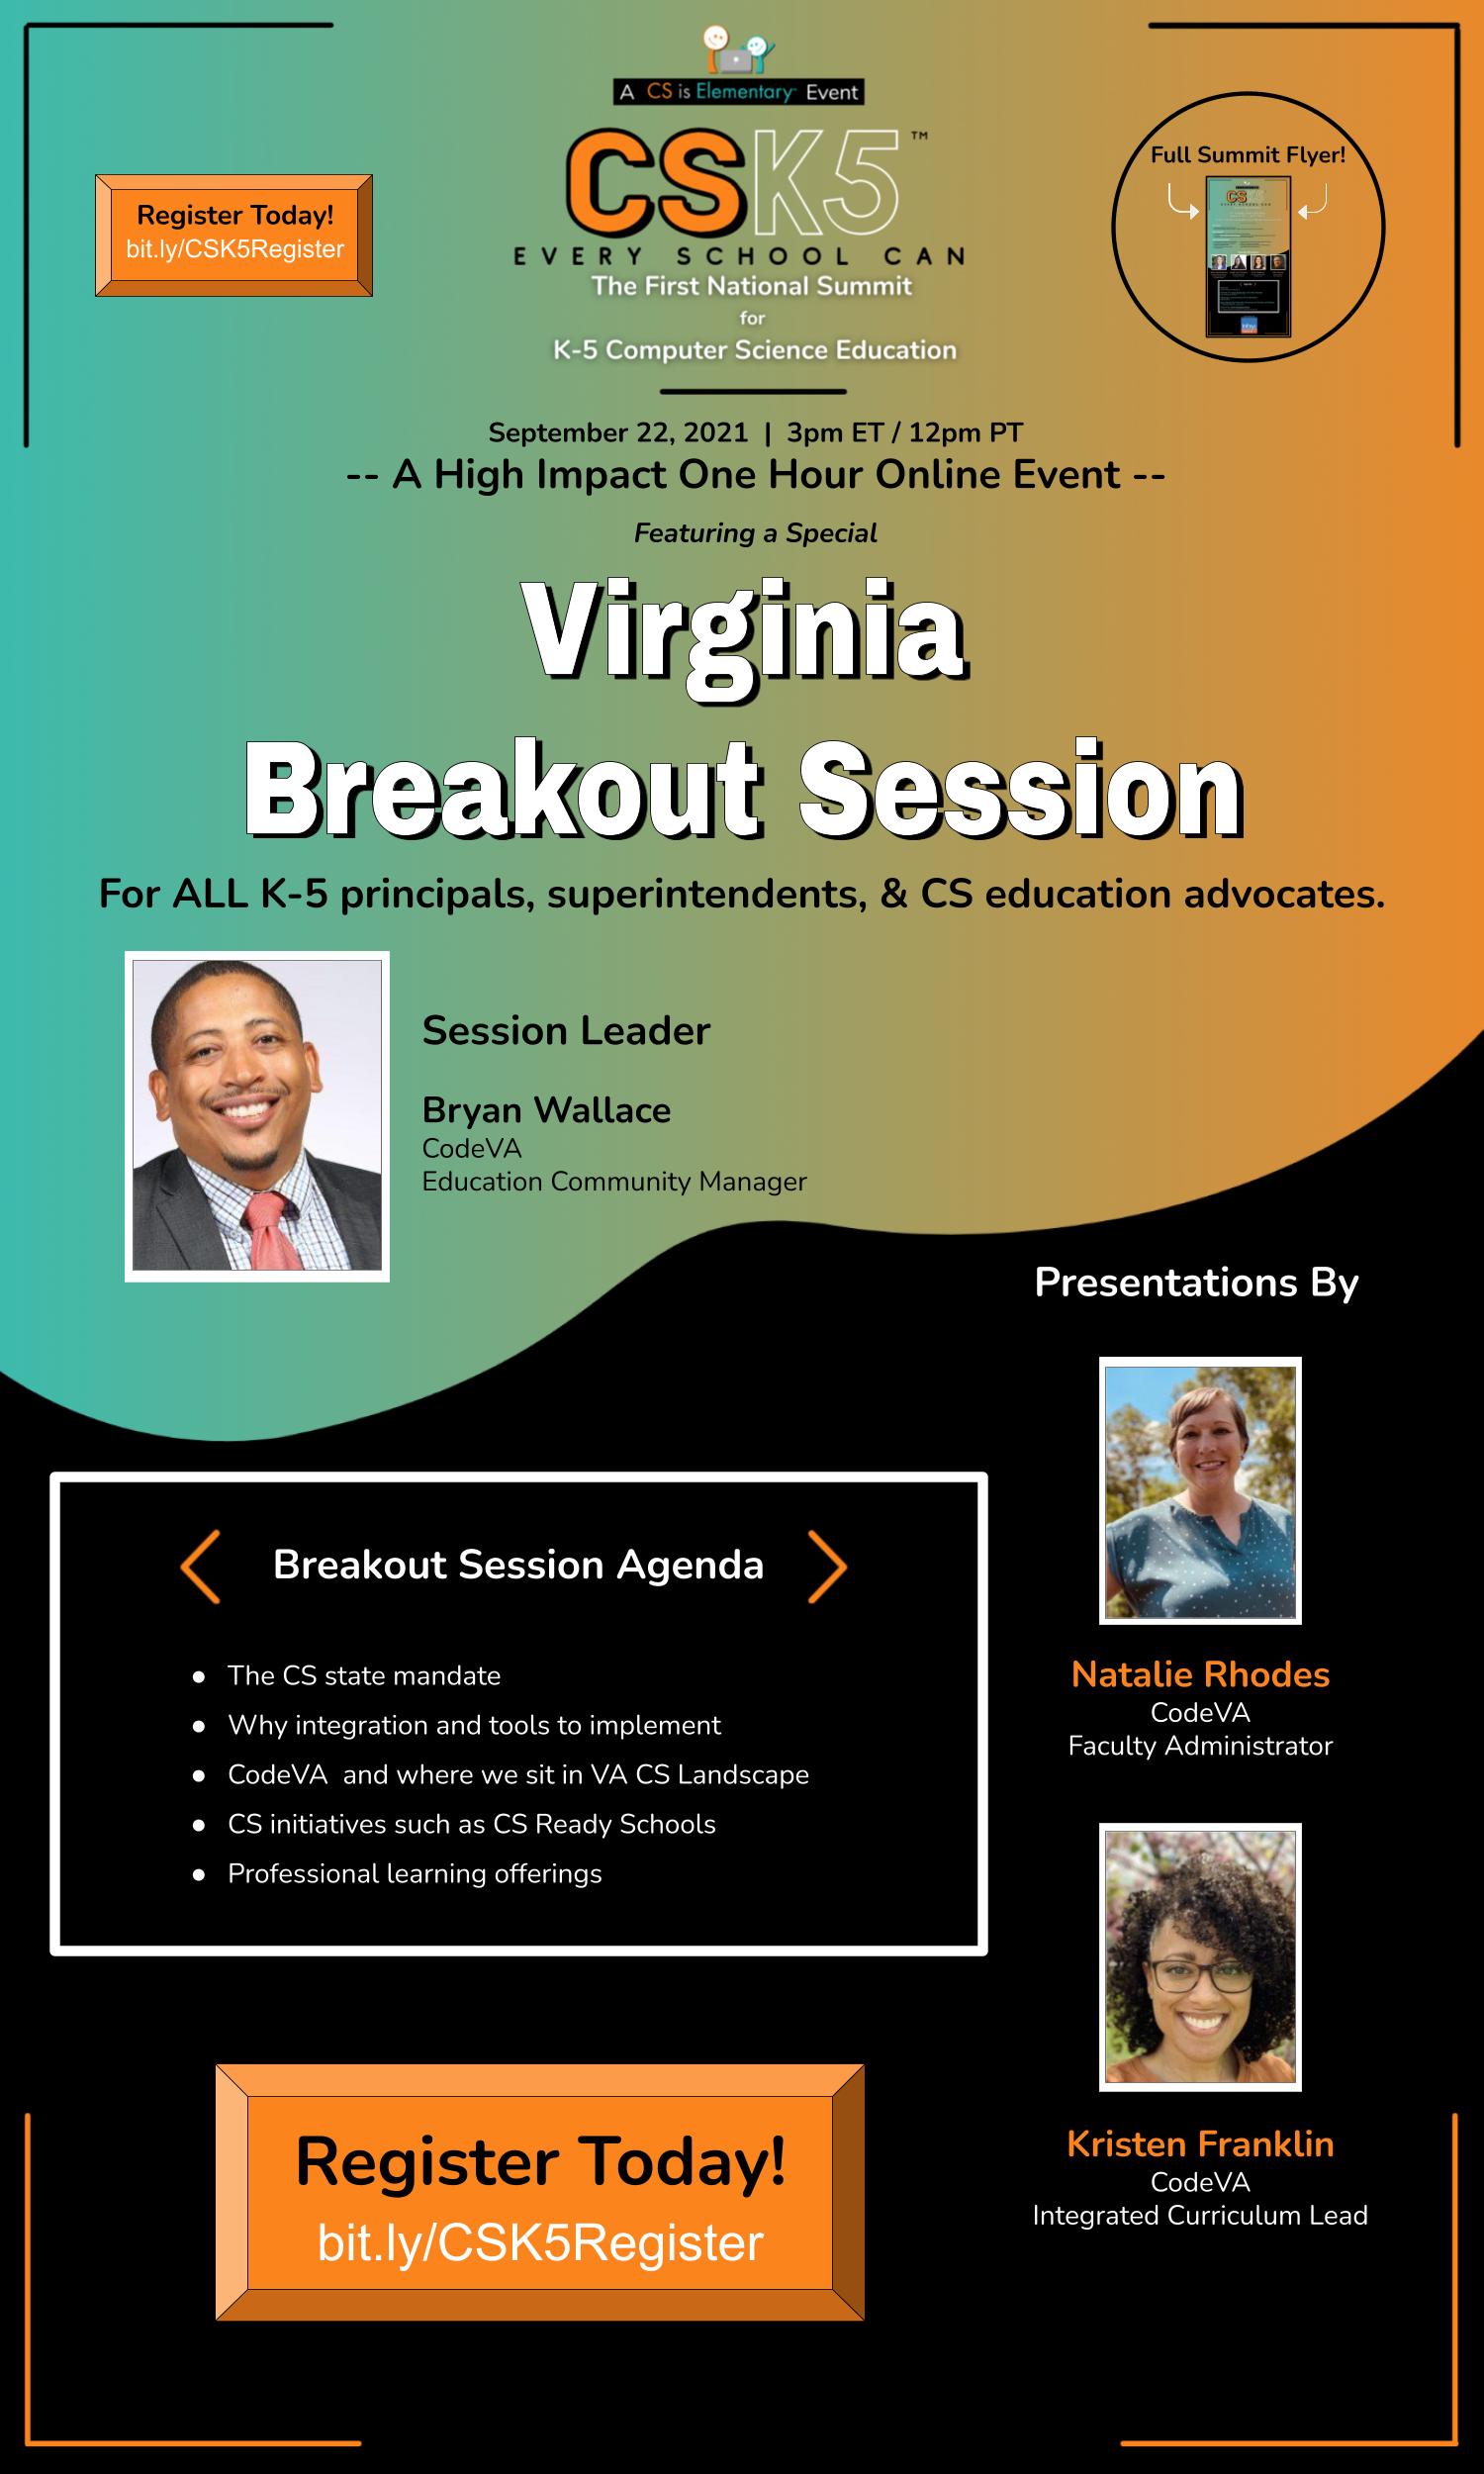 CSK5 Summit - Virginia Breakout Information